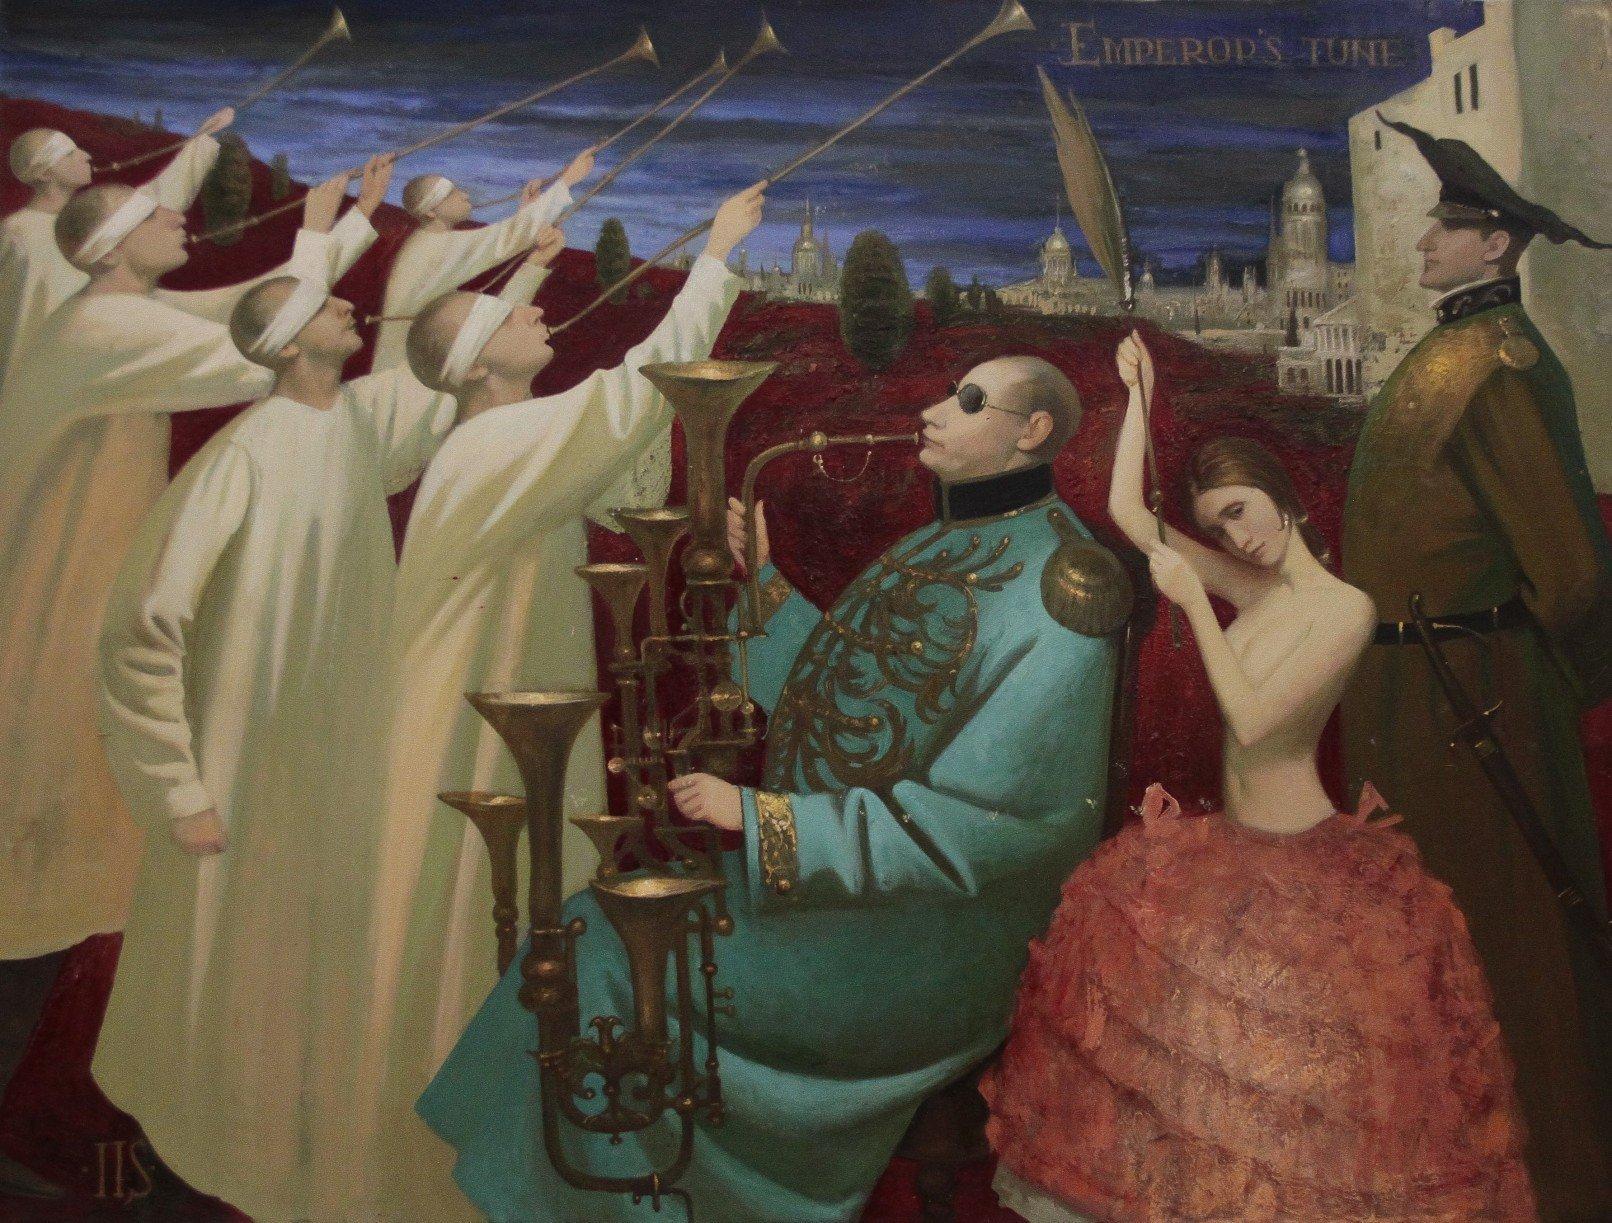 Igor Samsonov - Angelos, Igor Samsonov, Oil on Canvas